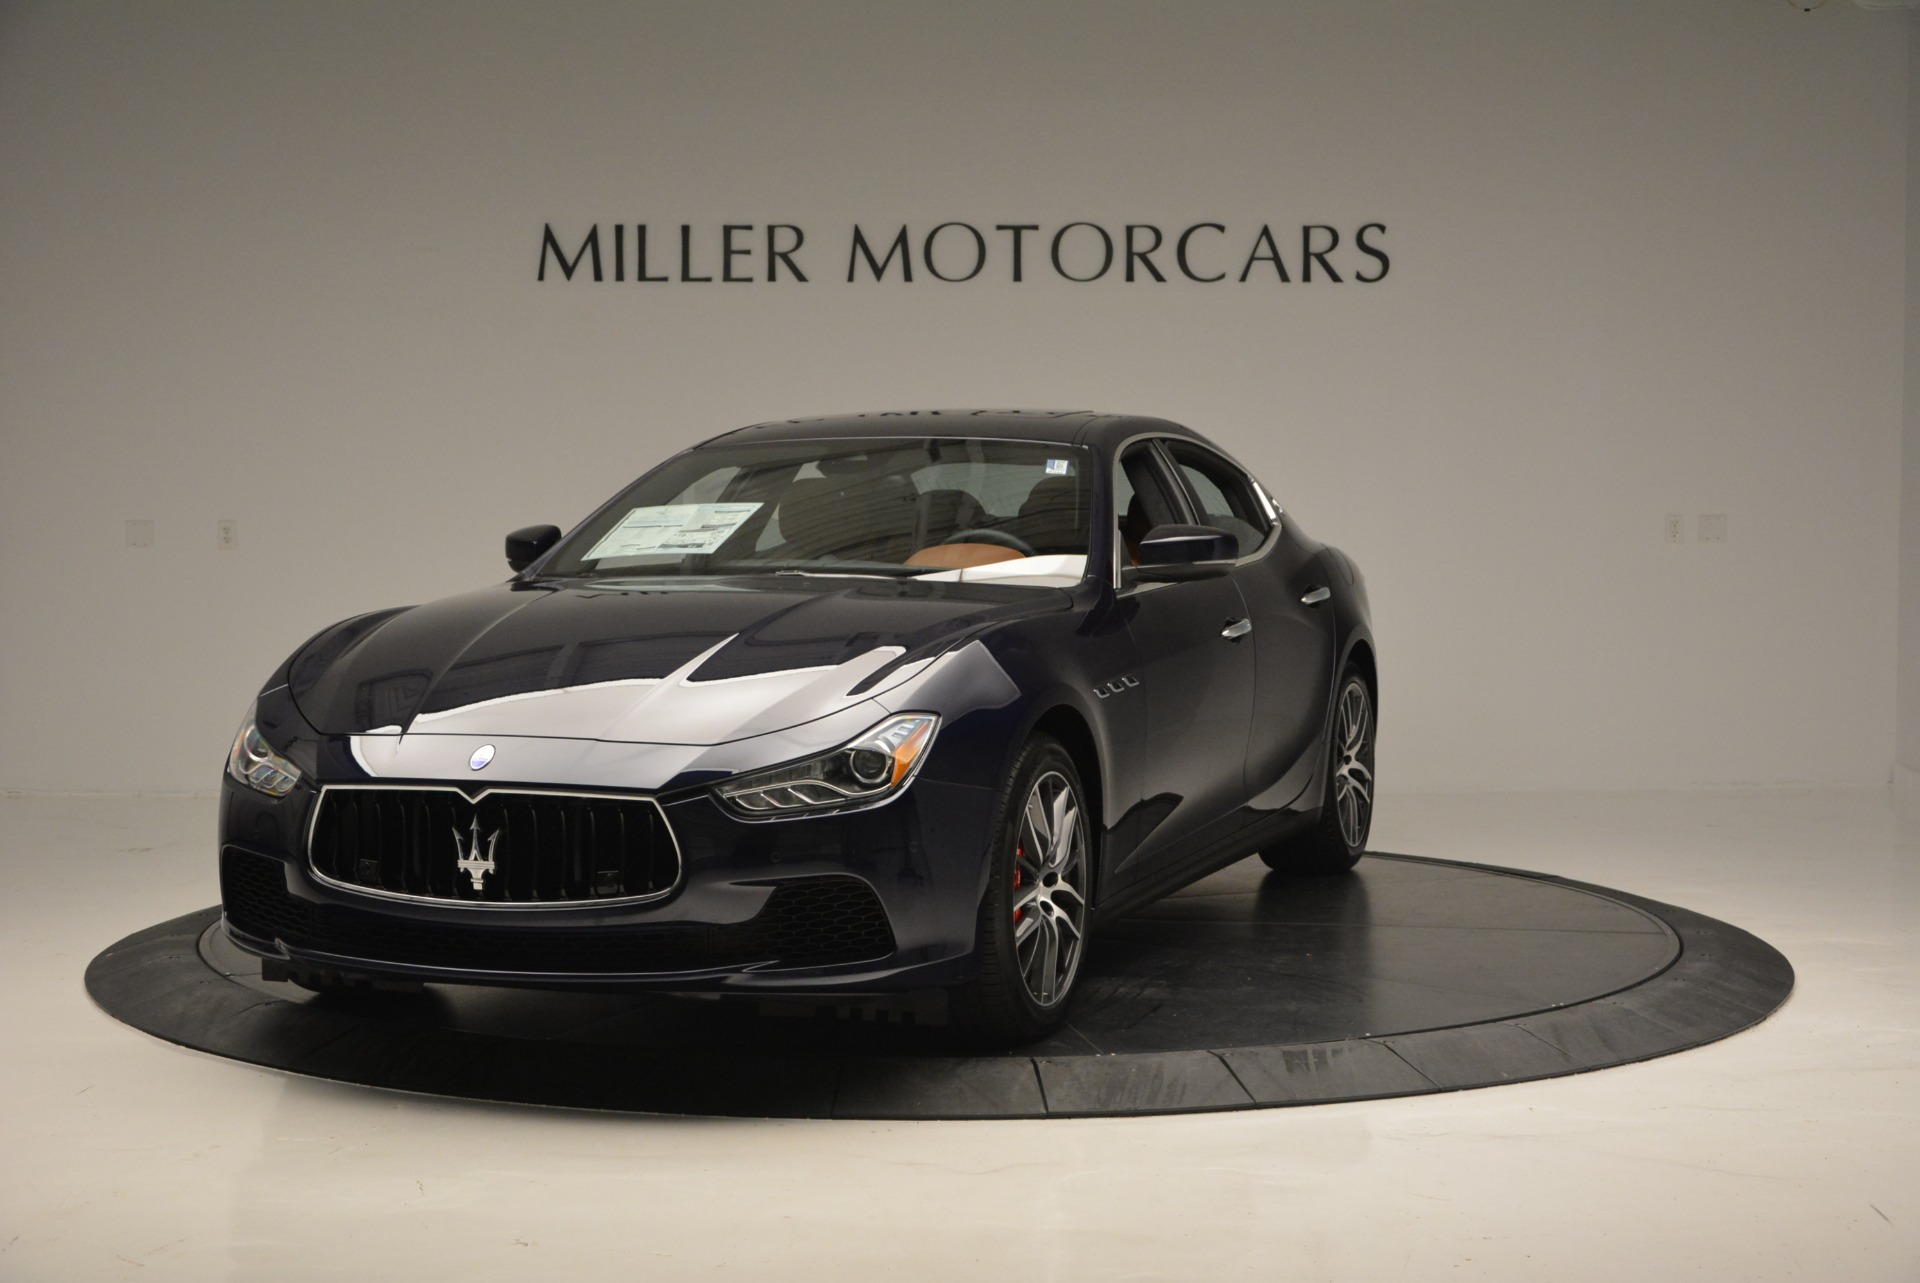 New 2017 Maserati Ghibli S Q4 For Sale In Greenwich, CT 580_main